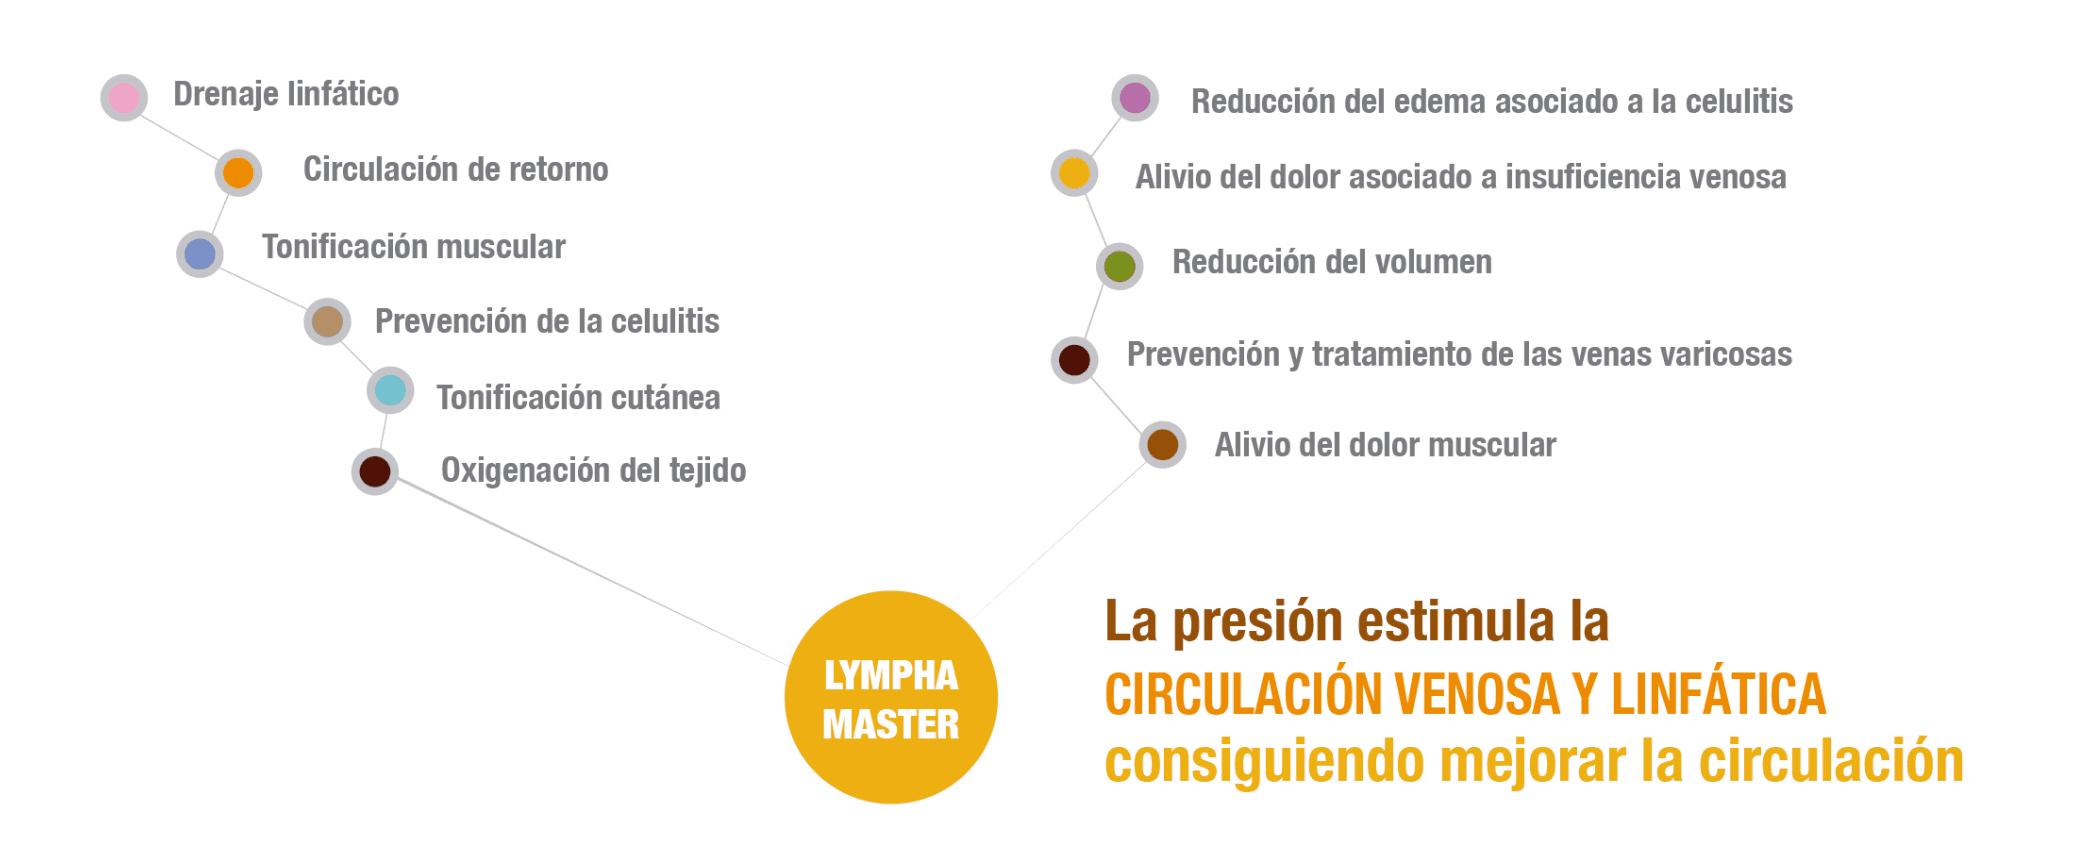 presoterapia profesional lympha master, aplicaciones circulación, celulitis. Belium medical distribuidor españa